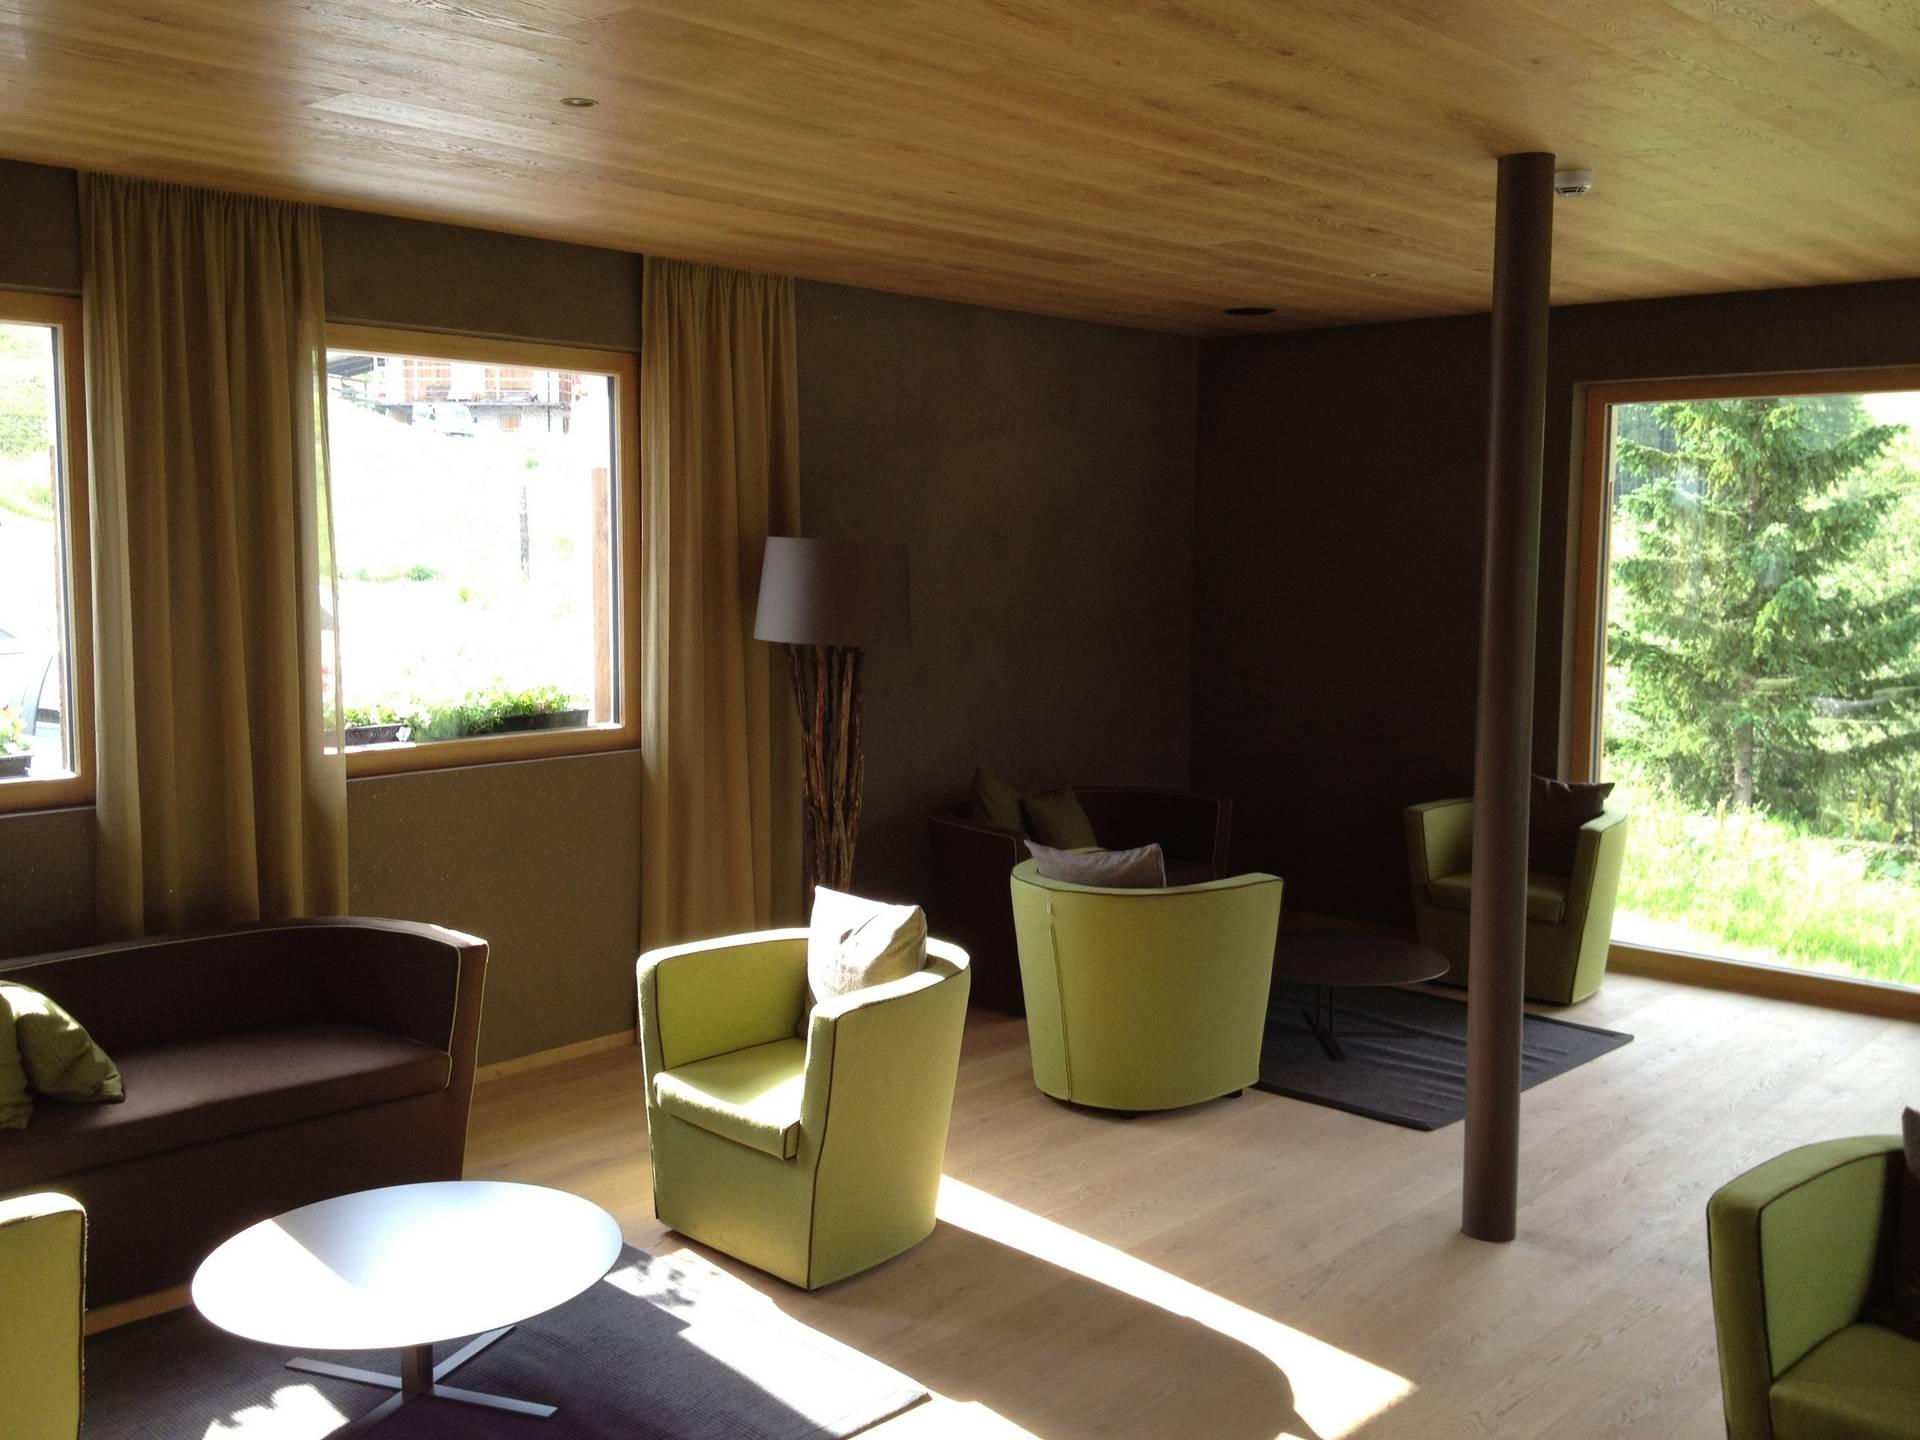 ihr hoteleinrichter in s dtirol selectiv hotelausstattung. Black Bedroom Furniture Sets. Home Design Ideas